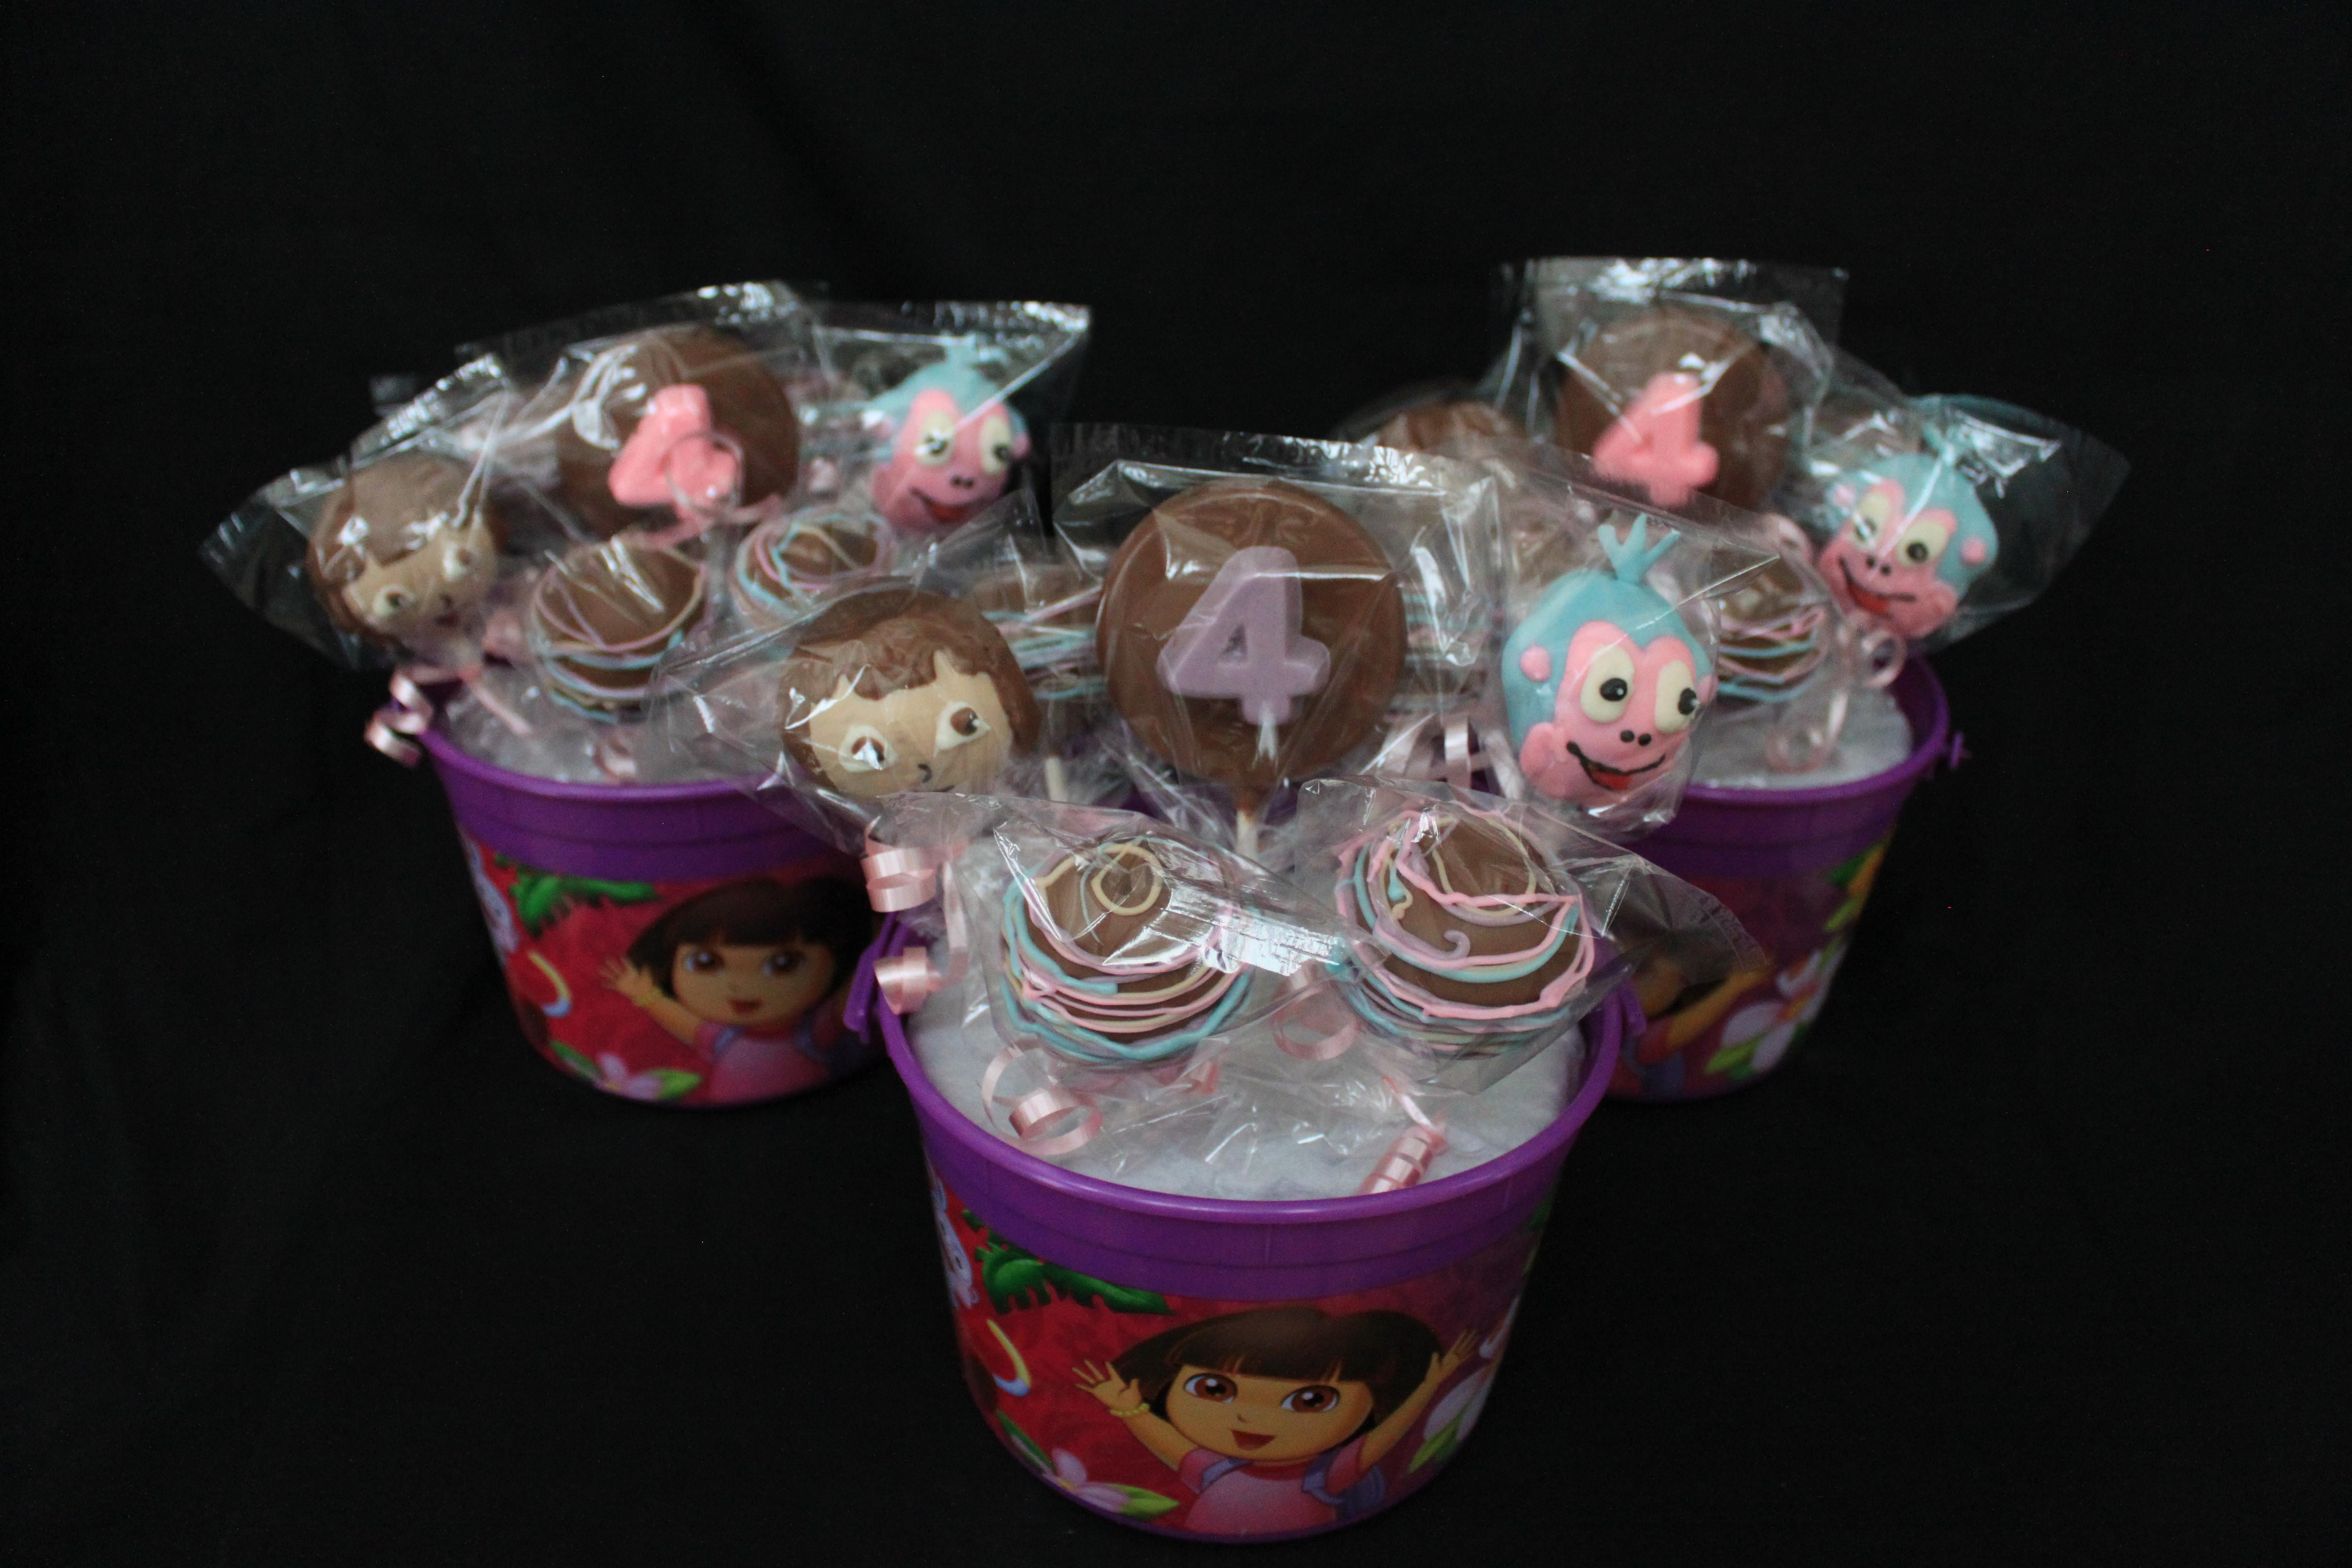 Dora & Boots cake pops